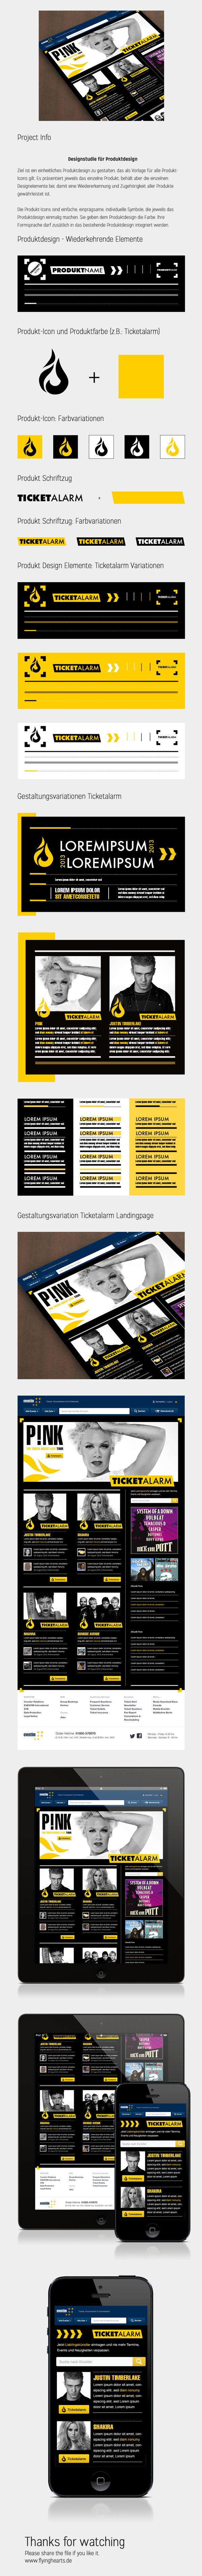 Product Design - Ticketalarm - Corporate Design by Melanie Grote, via Behance